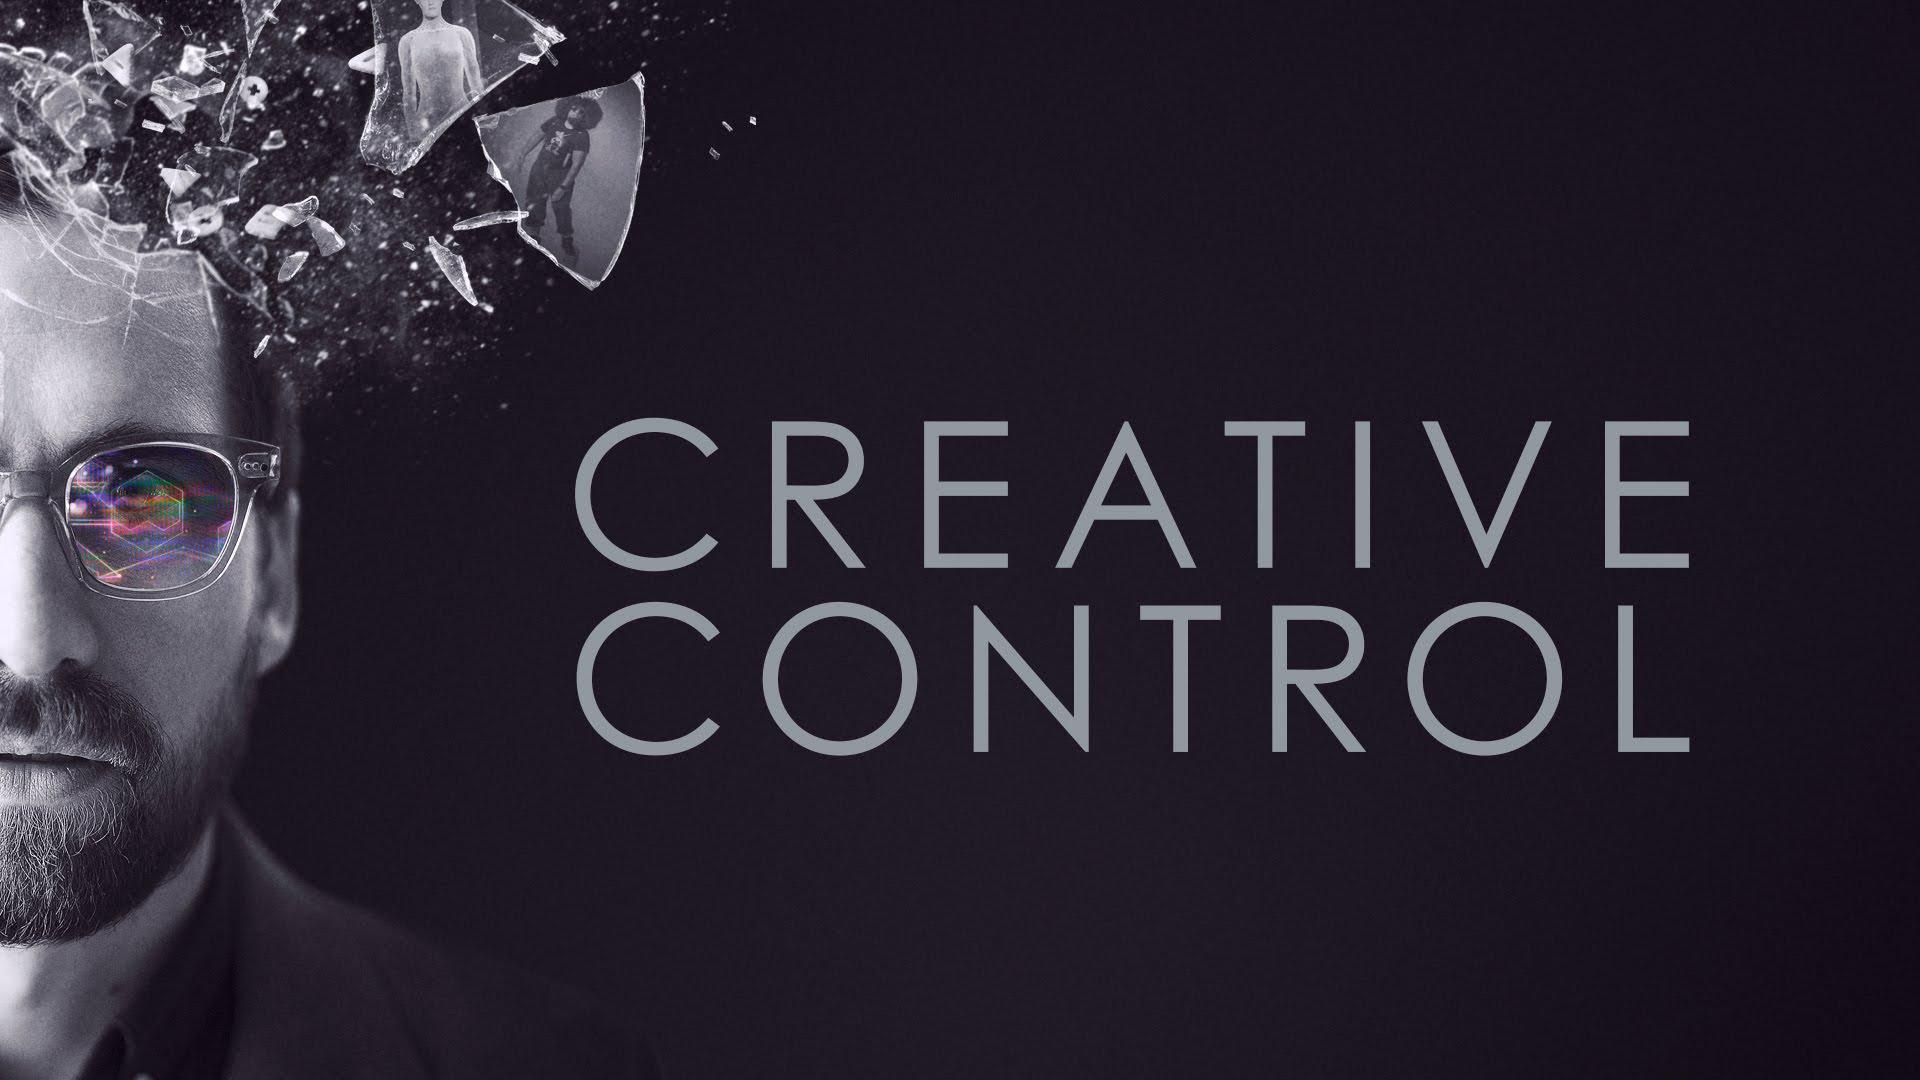 Creative Control, by Benjamin Dickinson